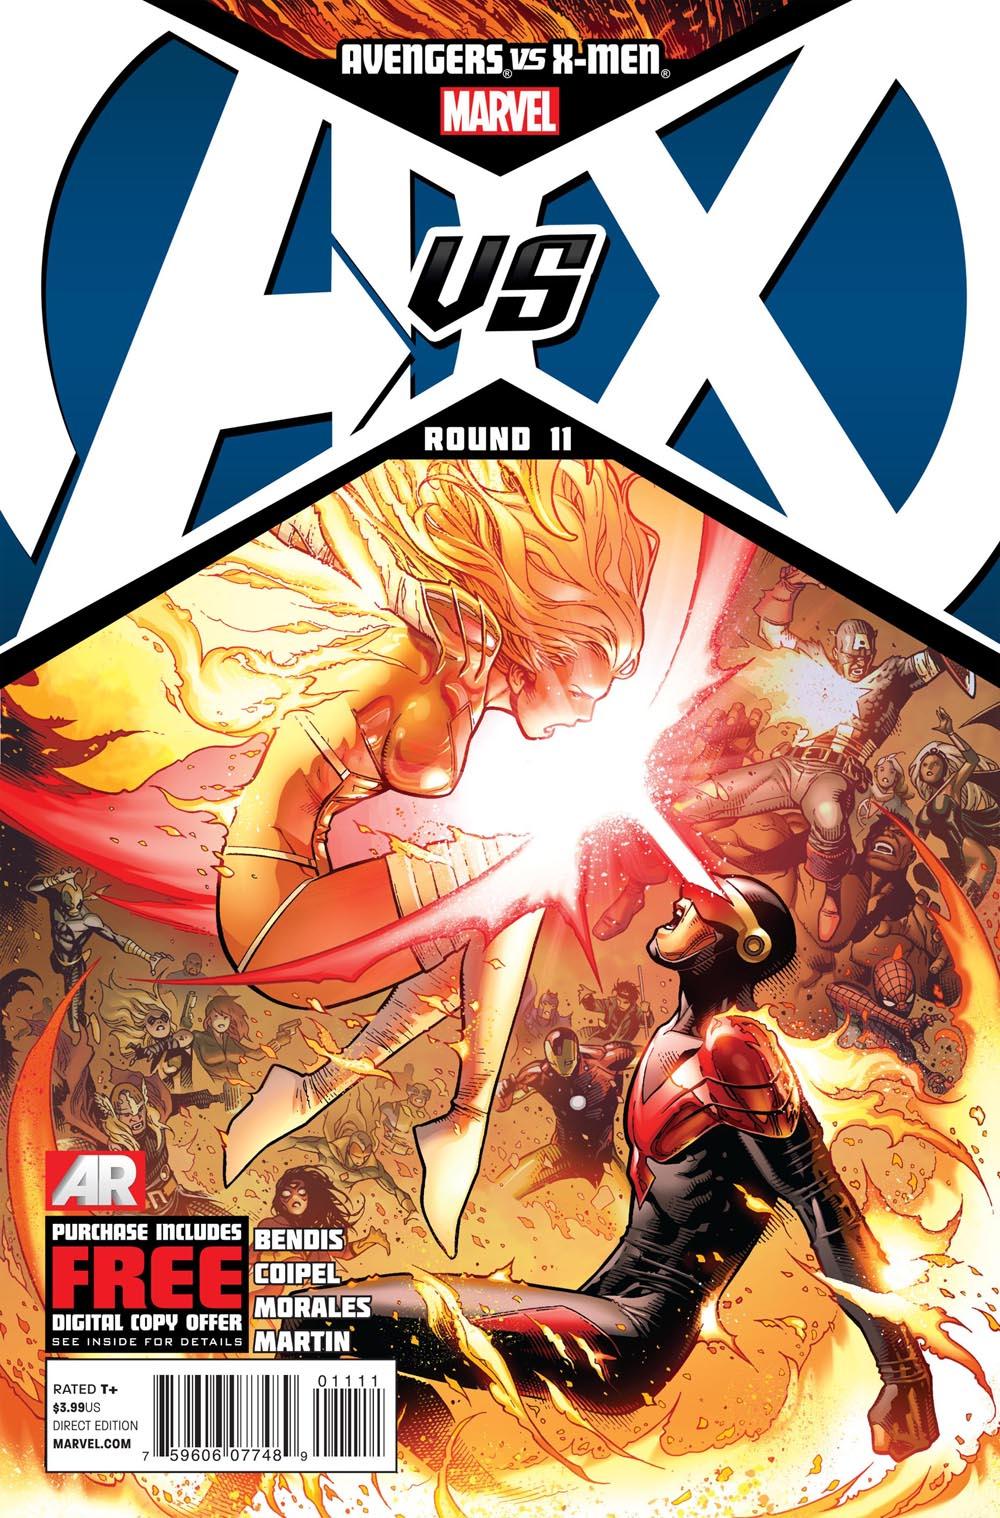 AVX_11_Cover Someone takes one for the team in AVENGERS VS. X-MEN #11